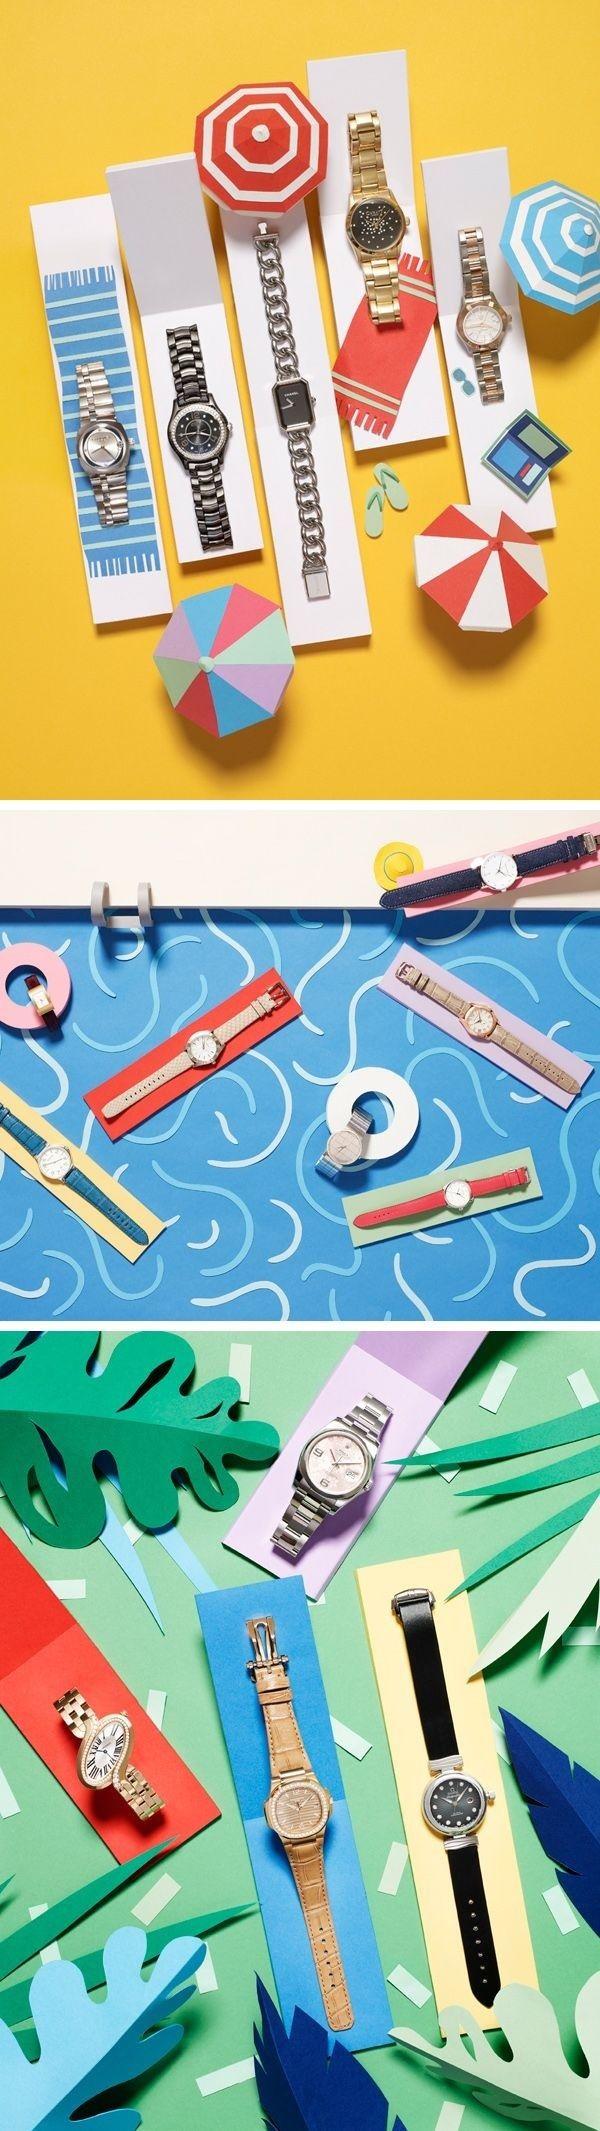 Designspiration — Design Inspiration | runcity | Pinterest ...